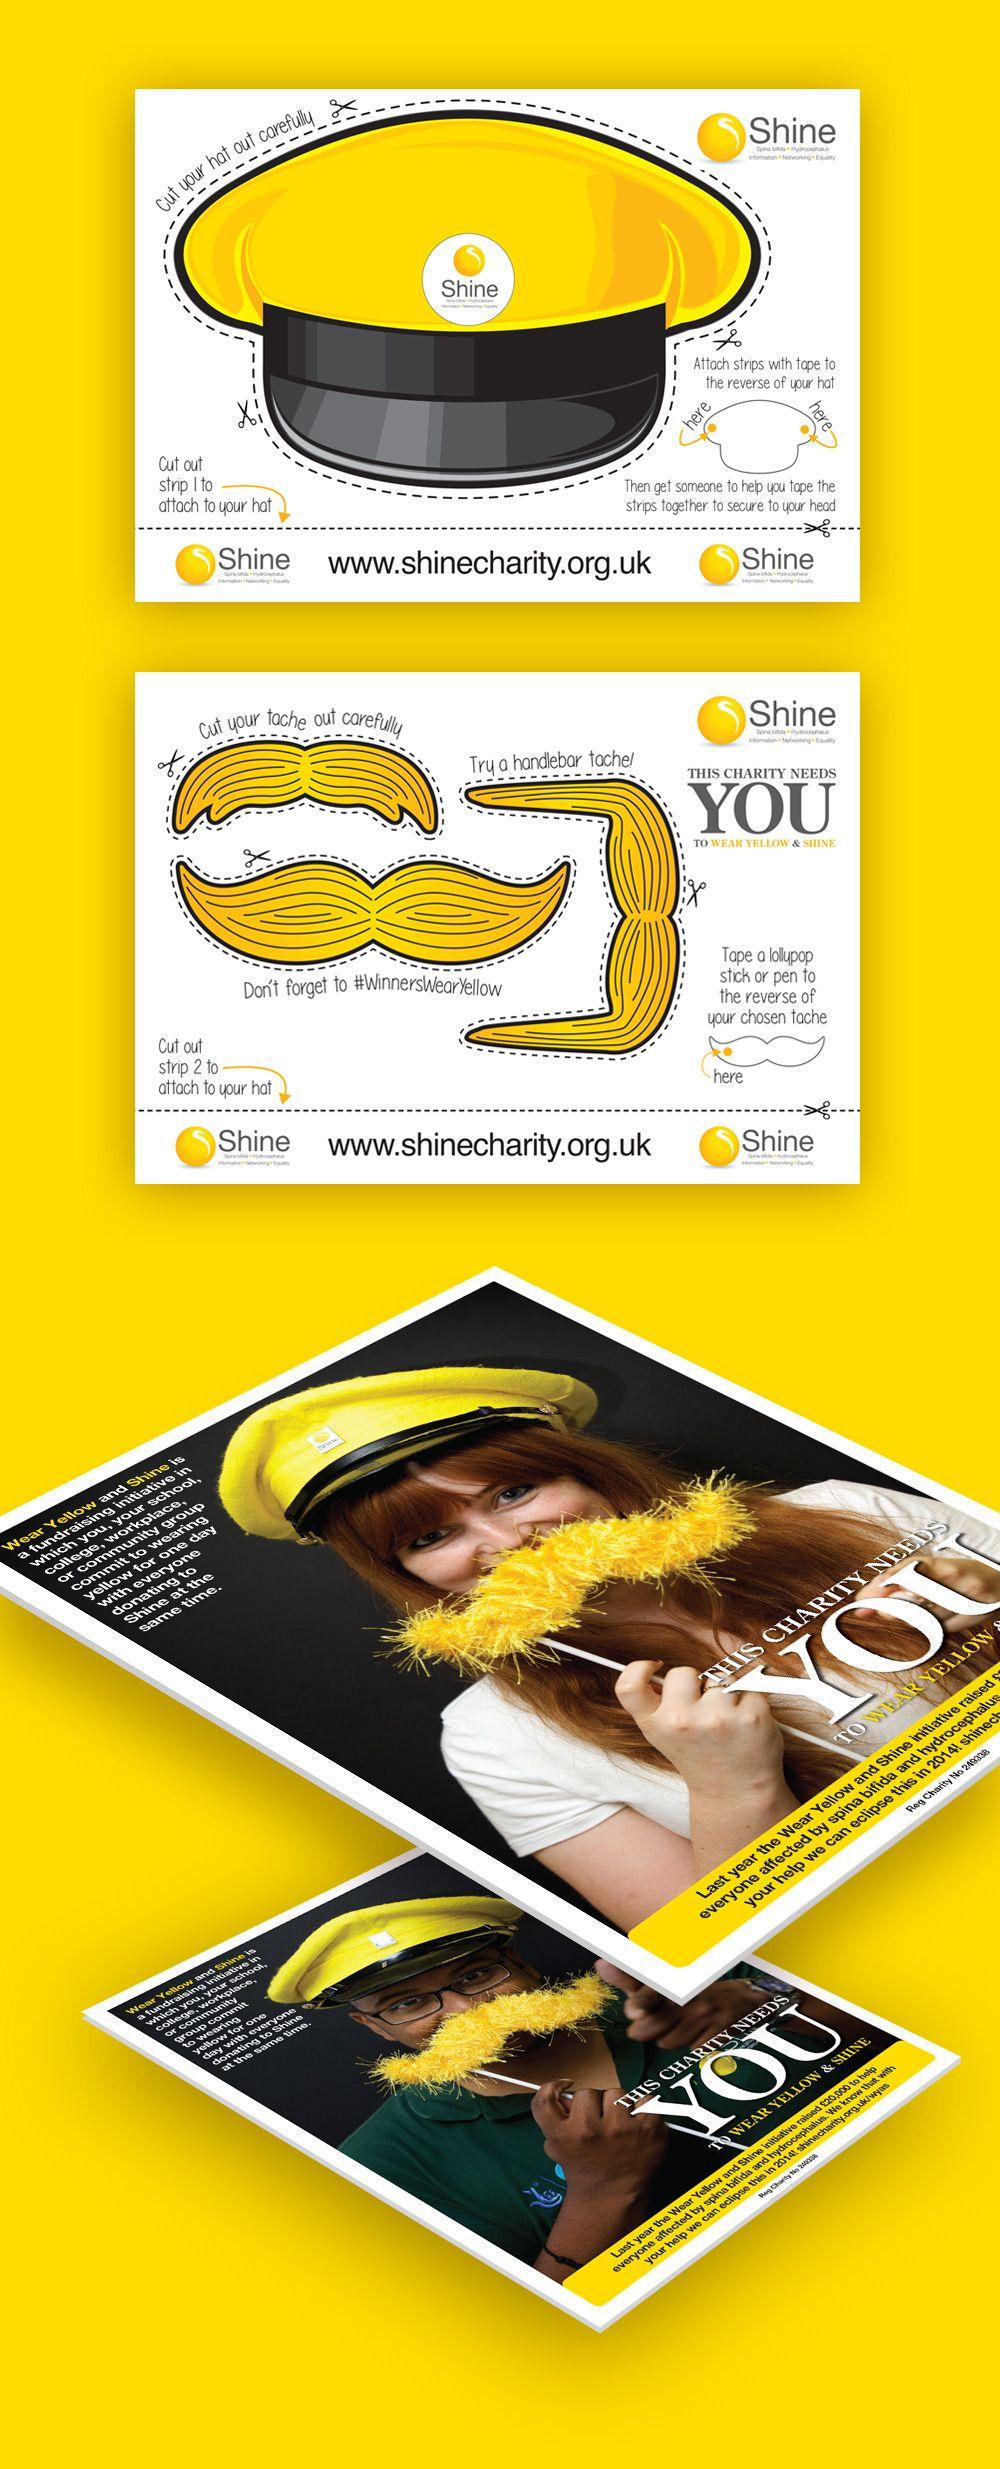 Shine Charity Wear Yellow and Shine campaign